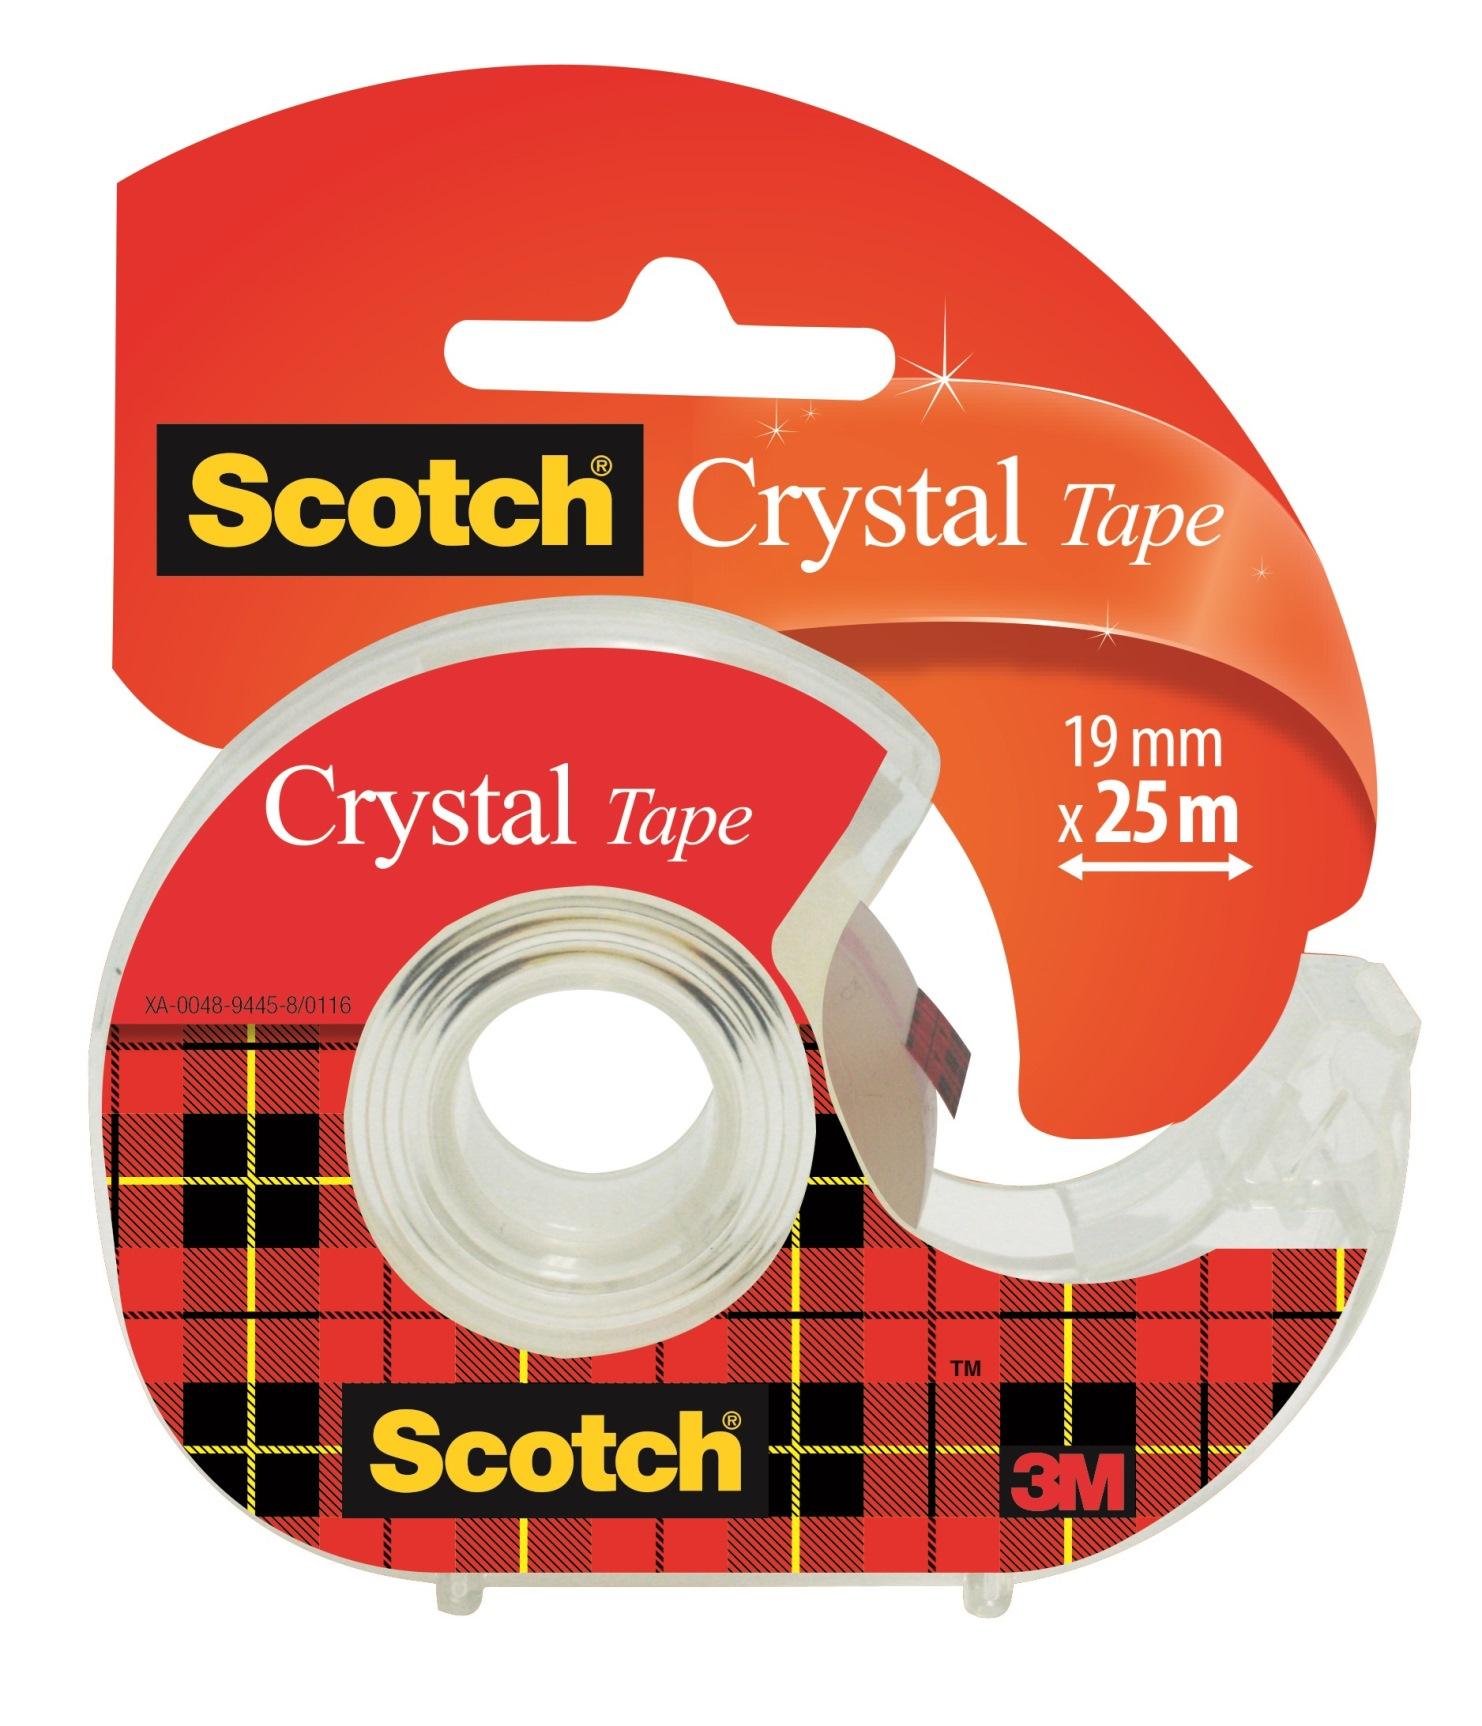 Scotch Crystal - Ruban adhésif - 19 mm x 25 m - transparent